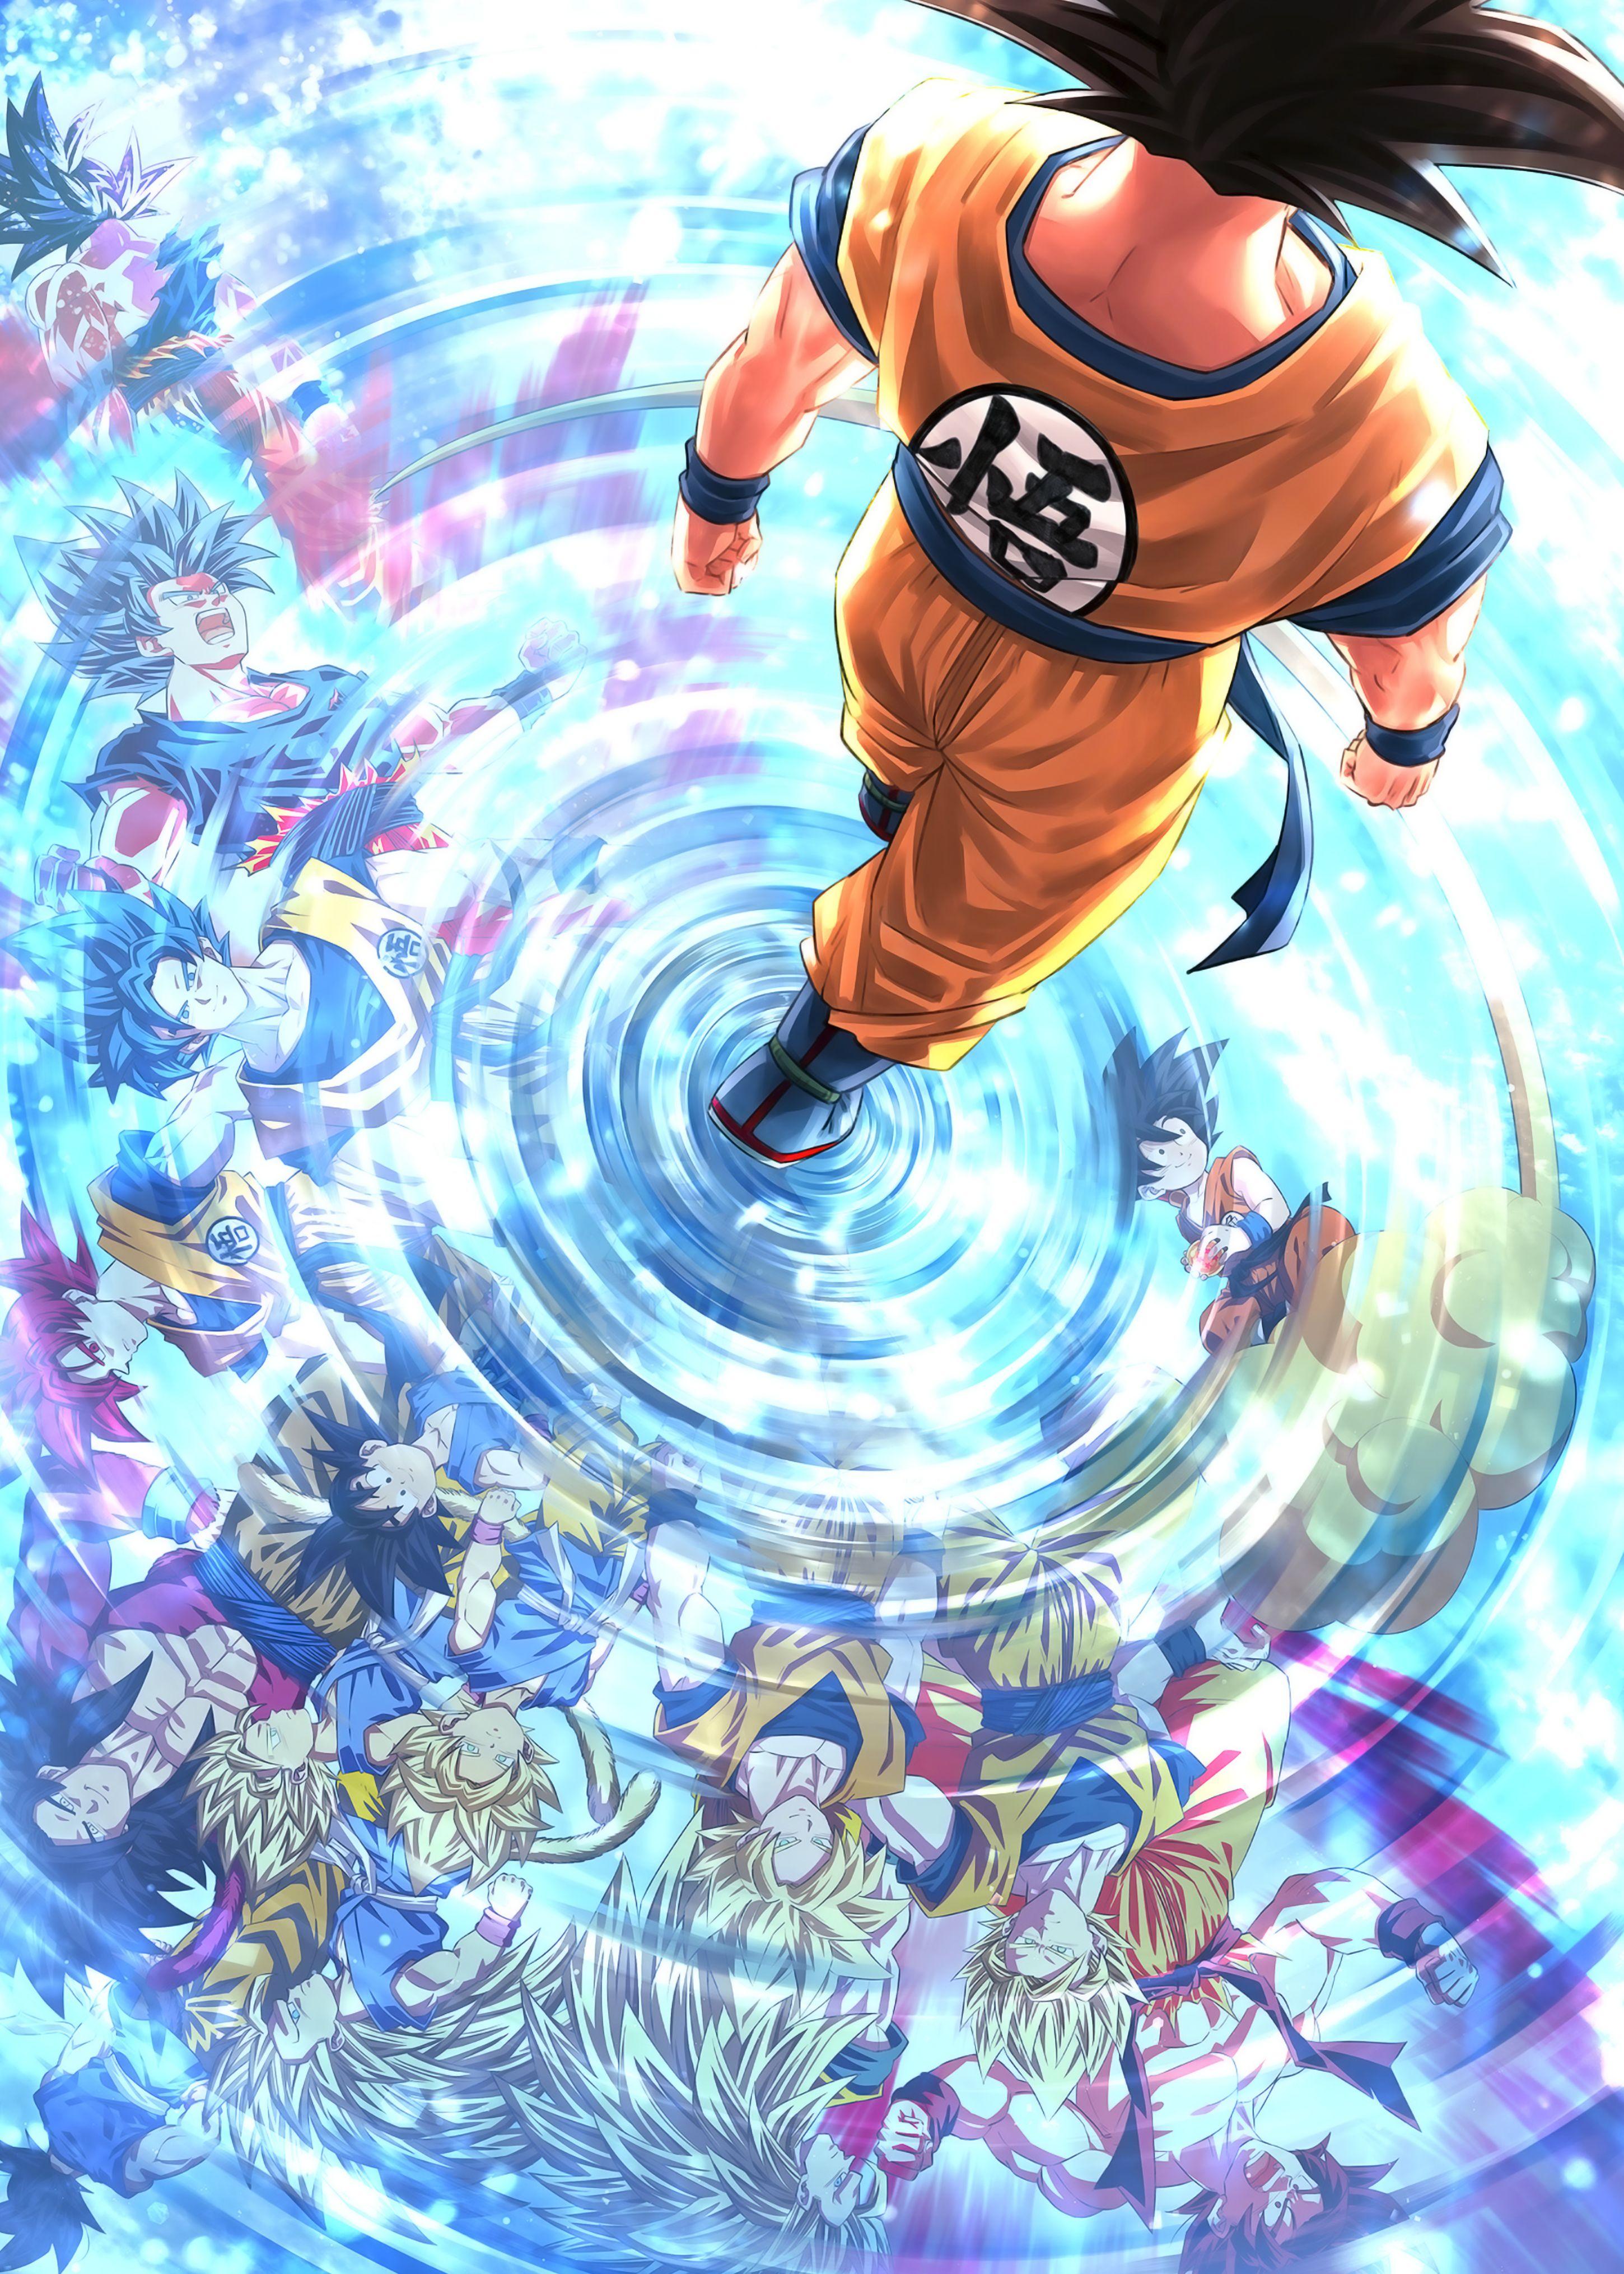 Goku Memories Metal Plate Dragon Ball Wallpaper Iphone Dragon Ball Super Artwork Dragon Ball Z Iphone Wallpaper